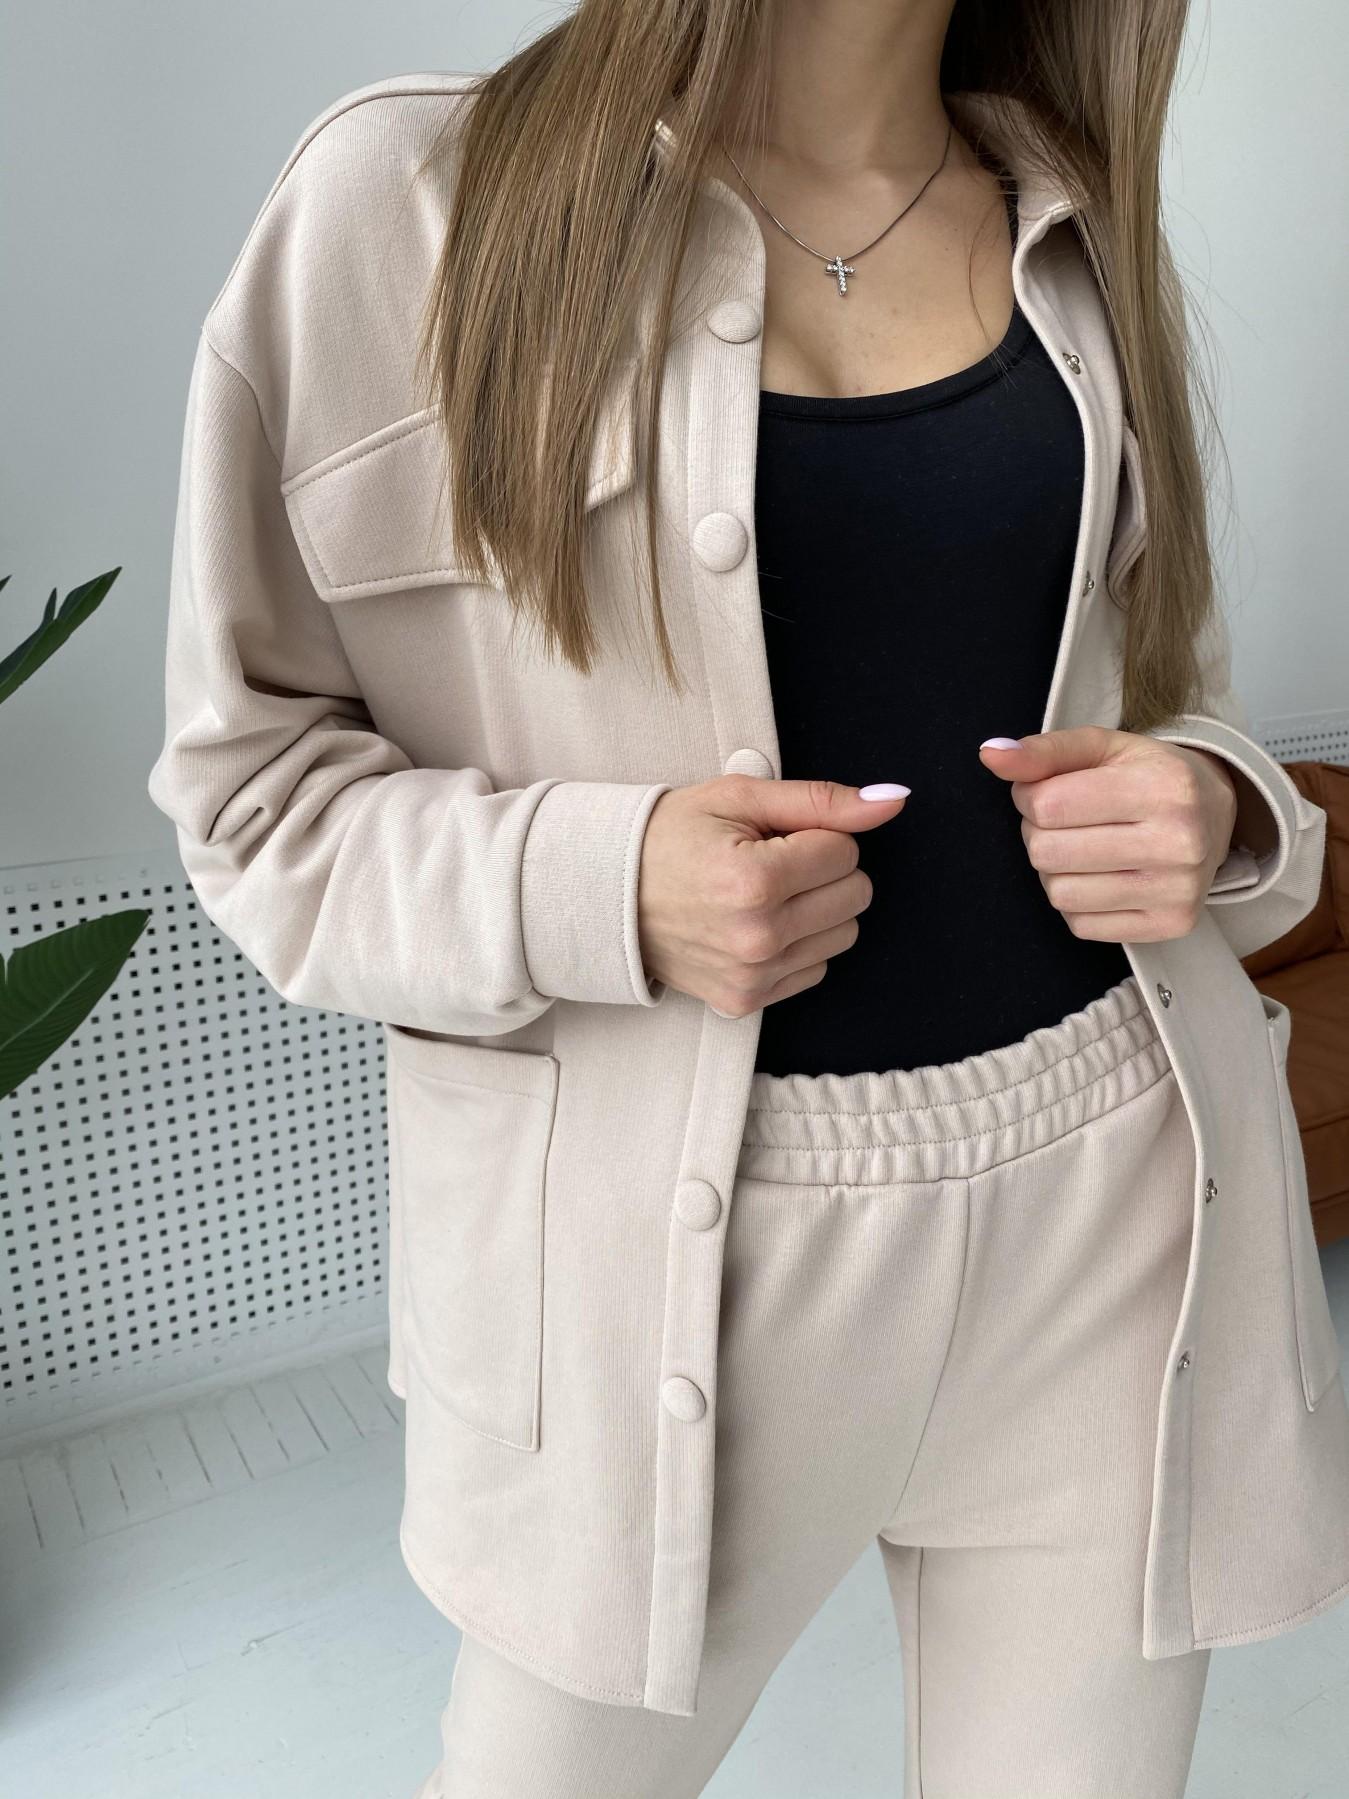 Респект костюм из трикотажа  3х нитка 11055 АРТ. 47537 Цвет: Бежевый - фото 3, интернет магазин tm-modus.ru